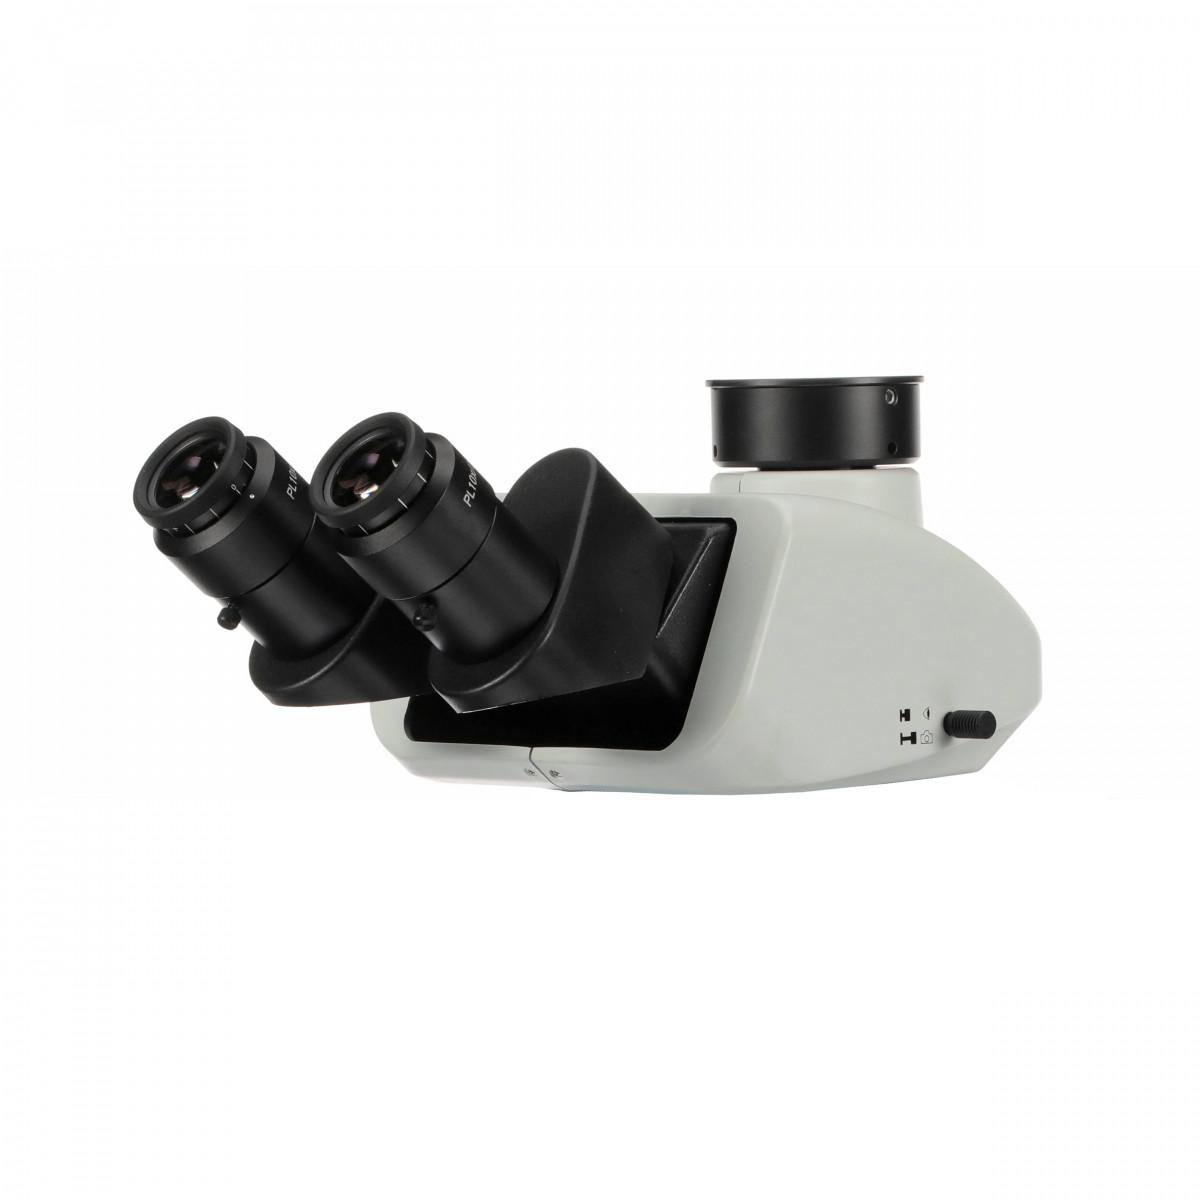 112-11-03 ErgoTrinocular Viewing Head - Z12 Series- Side View